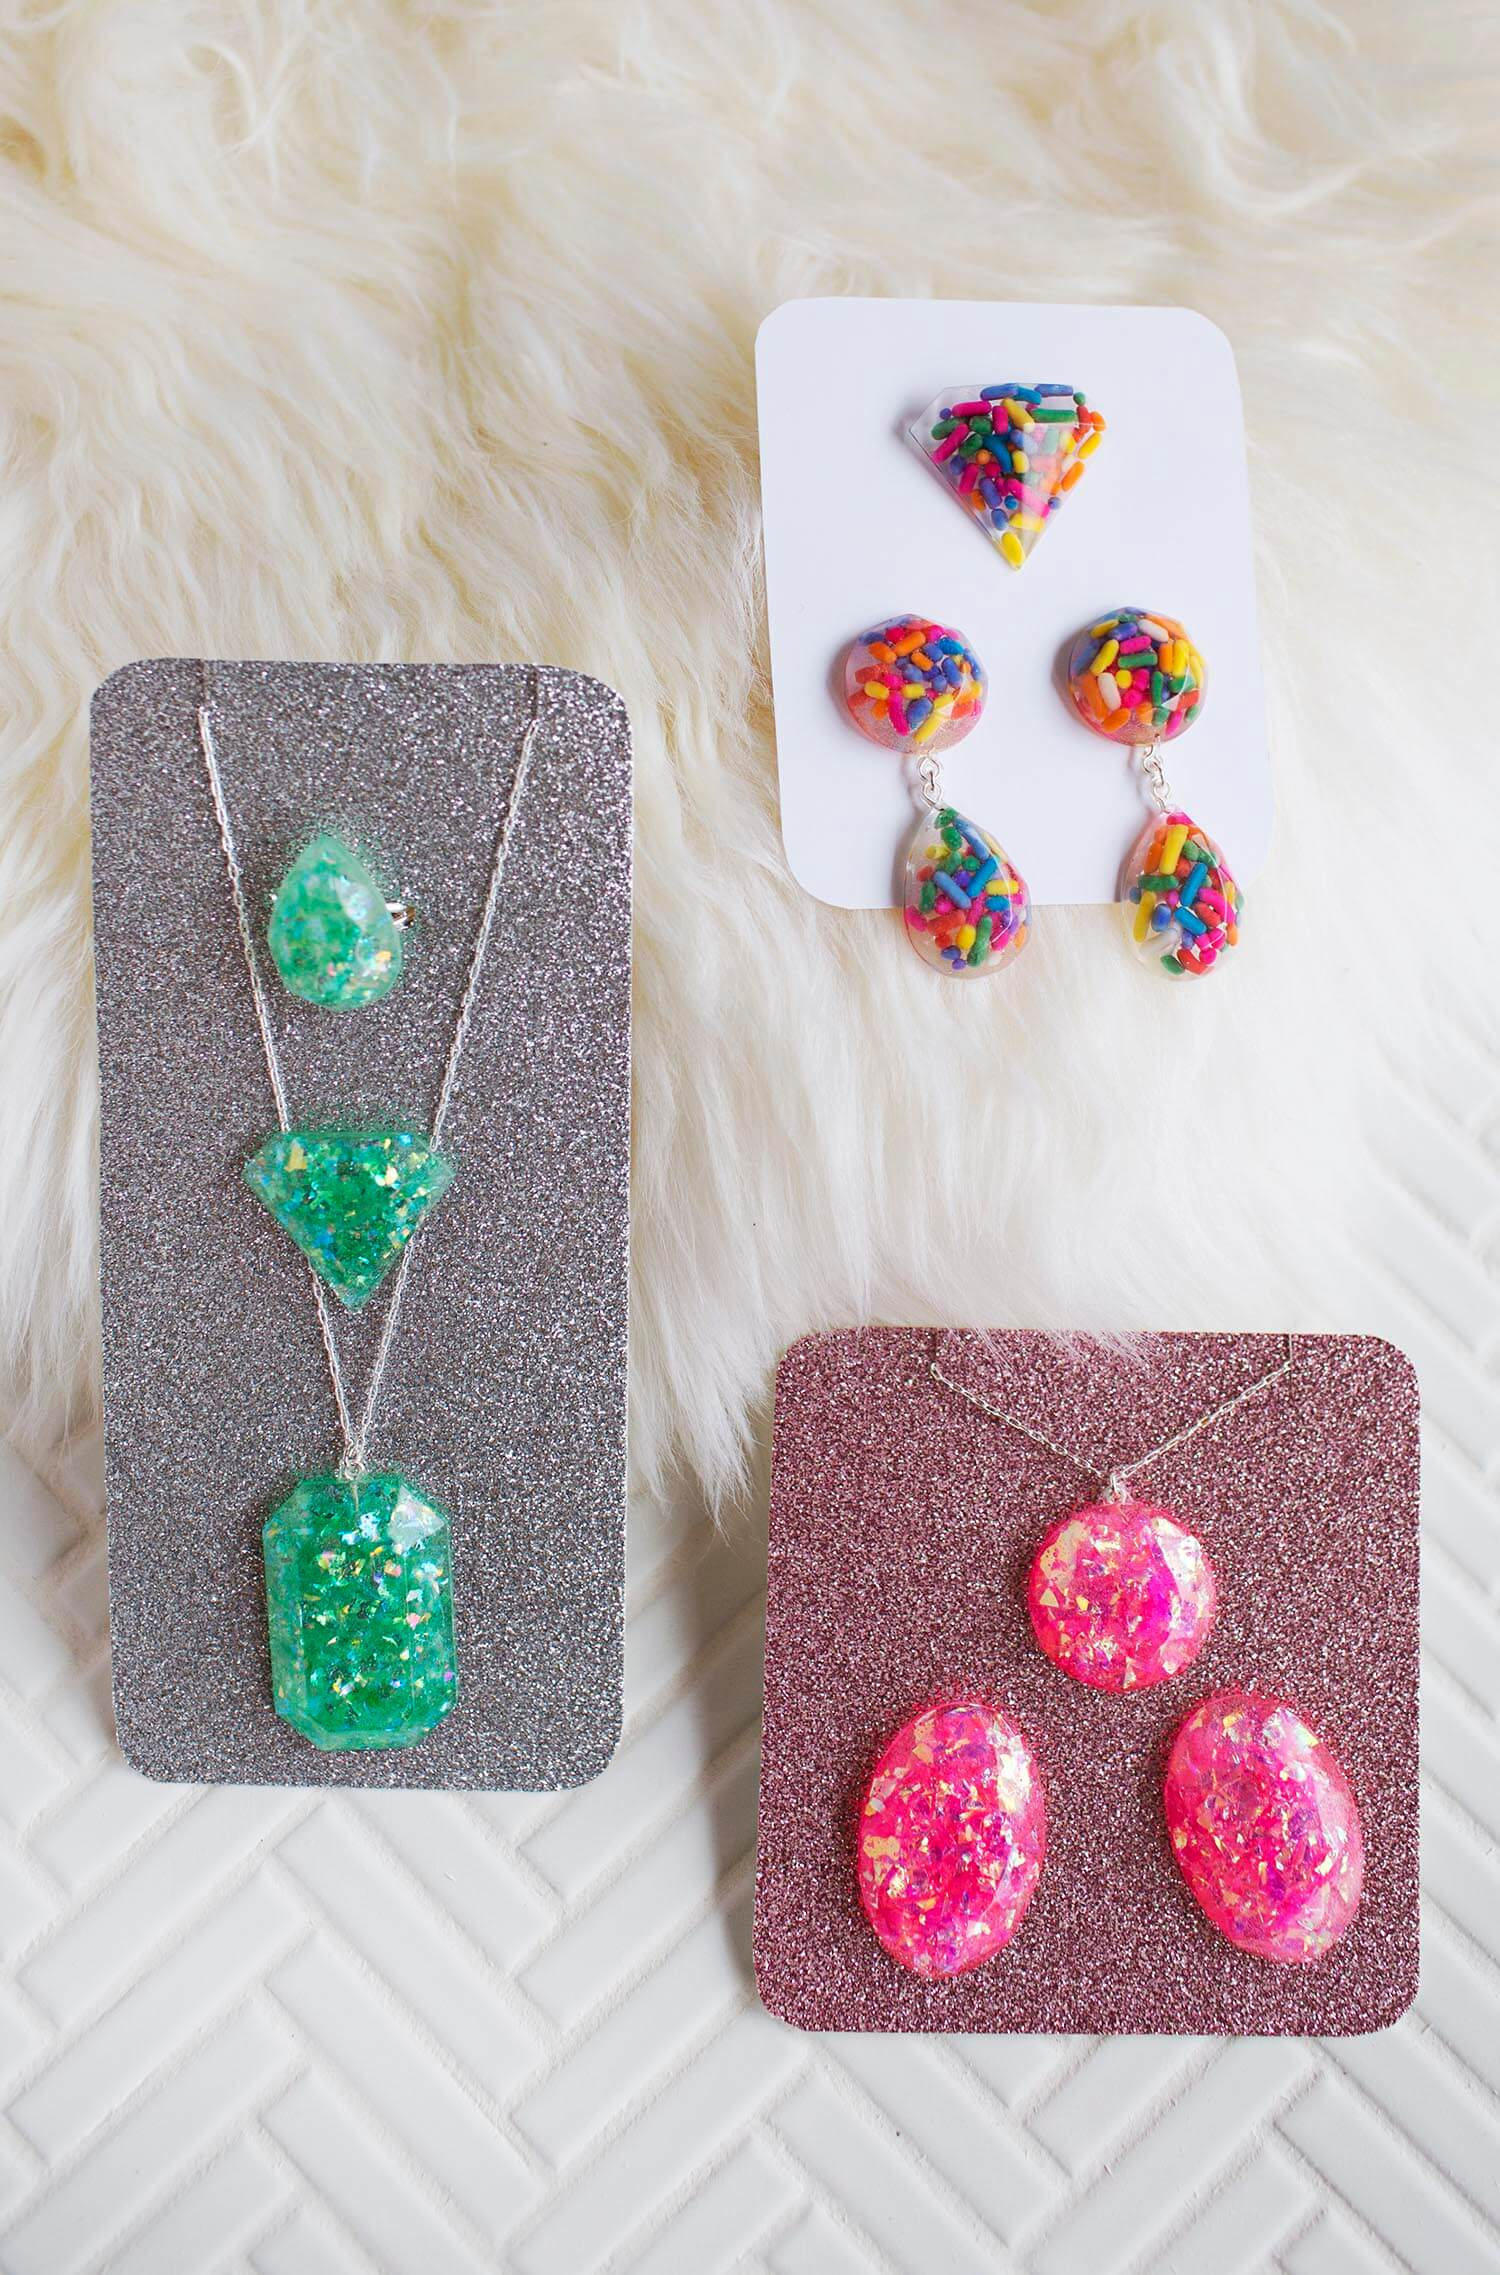 Diy epoxy resin jewelry a beautiful mess diy epoxy resin jewelry via abeautifulmess solutioingenieria Choice Image